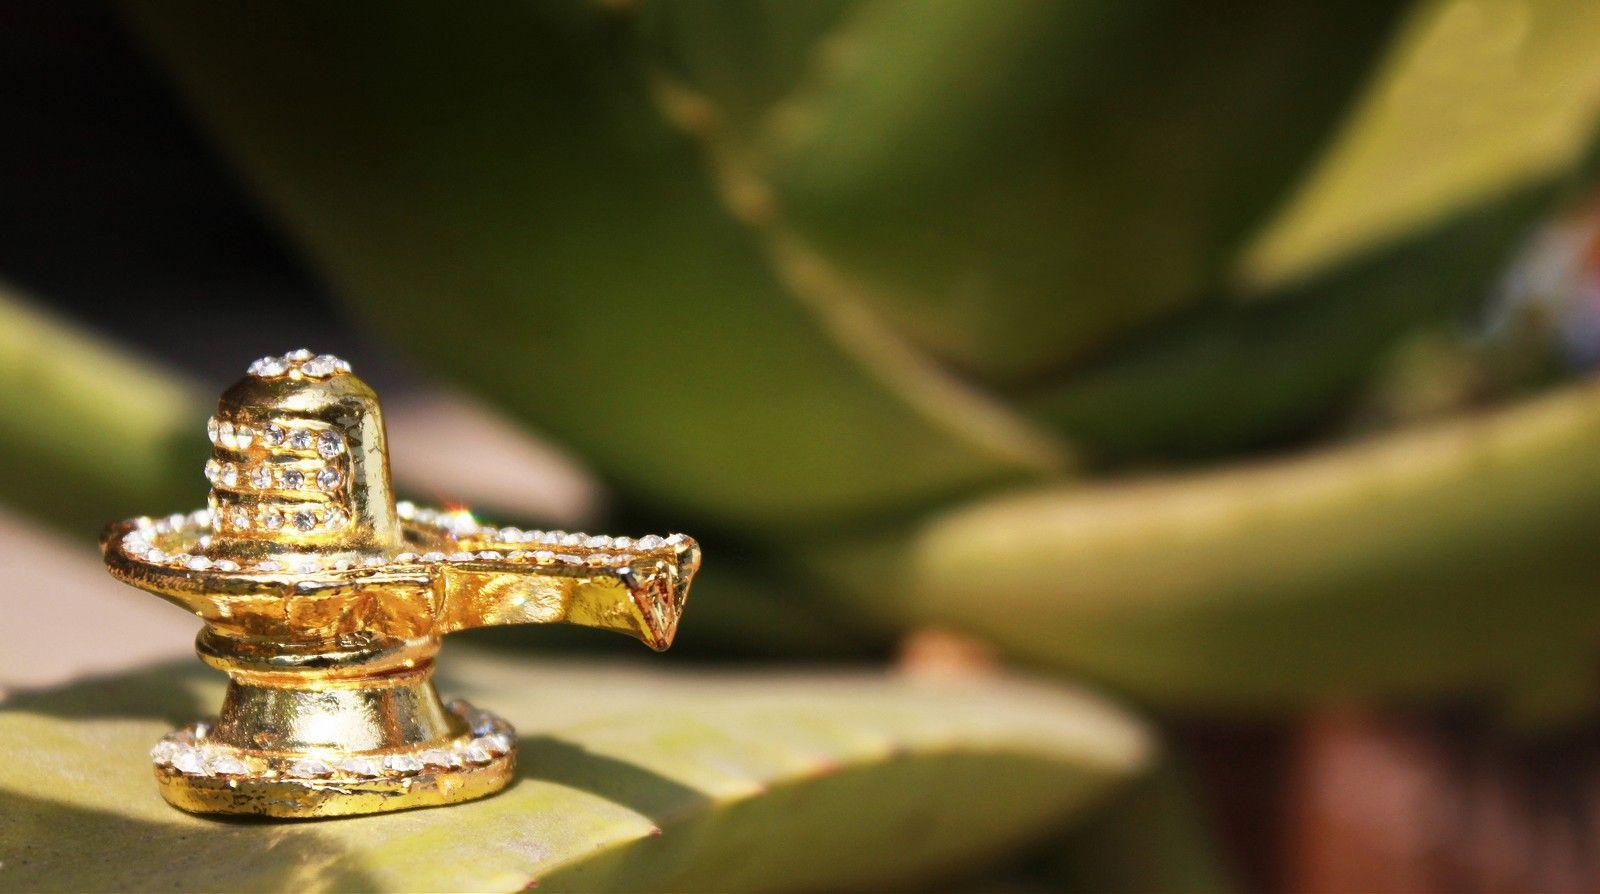 Shiv Linga With High Width Yahoo Image Search Results Shiva Lord Shiva Shiva Linga